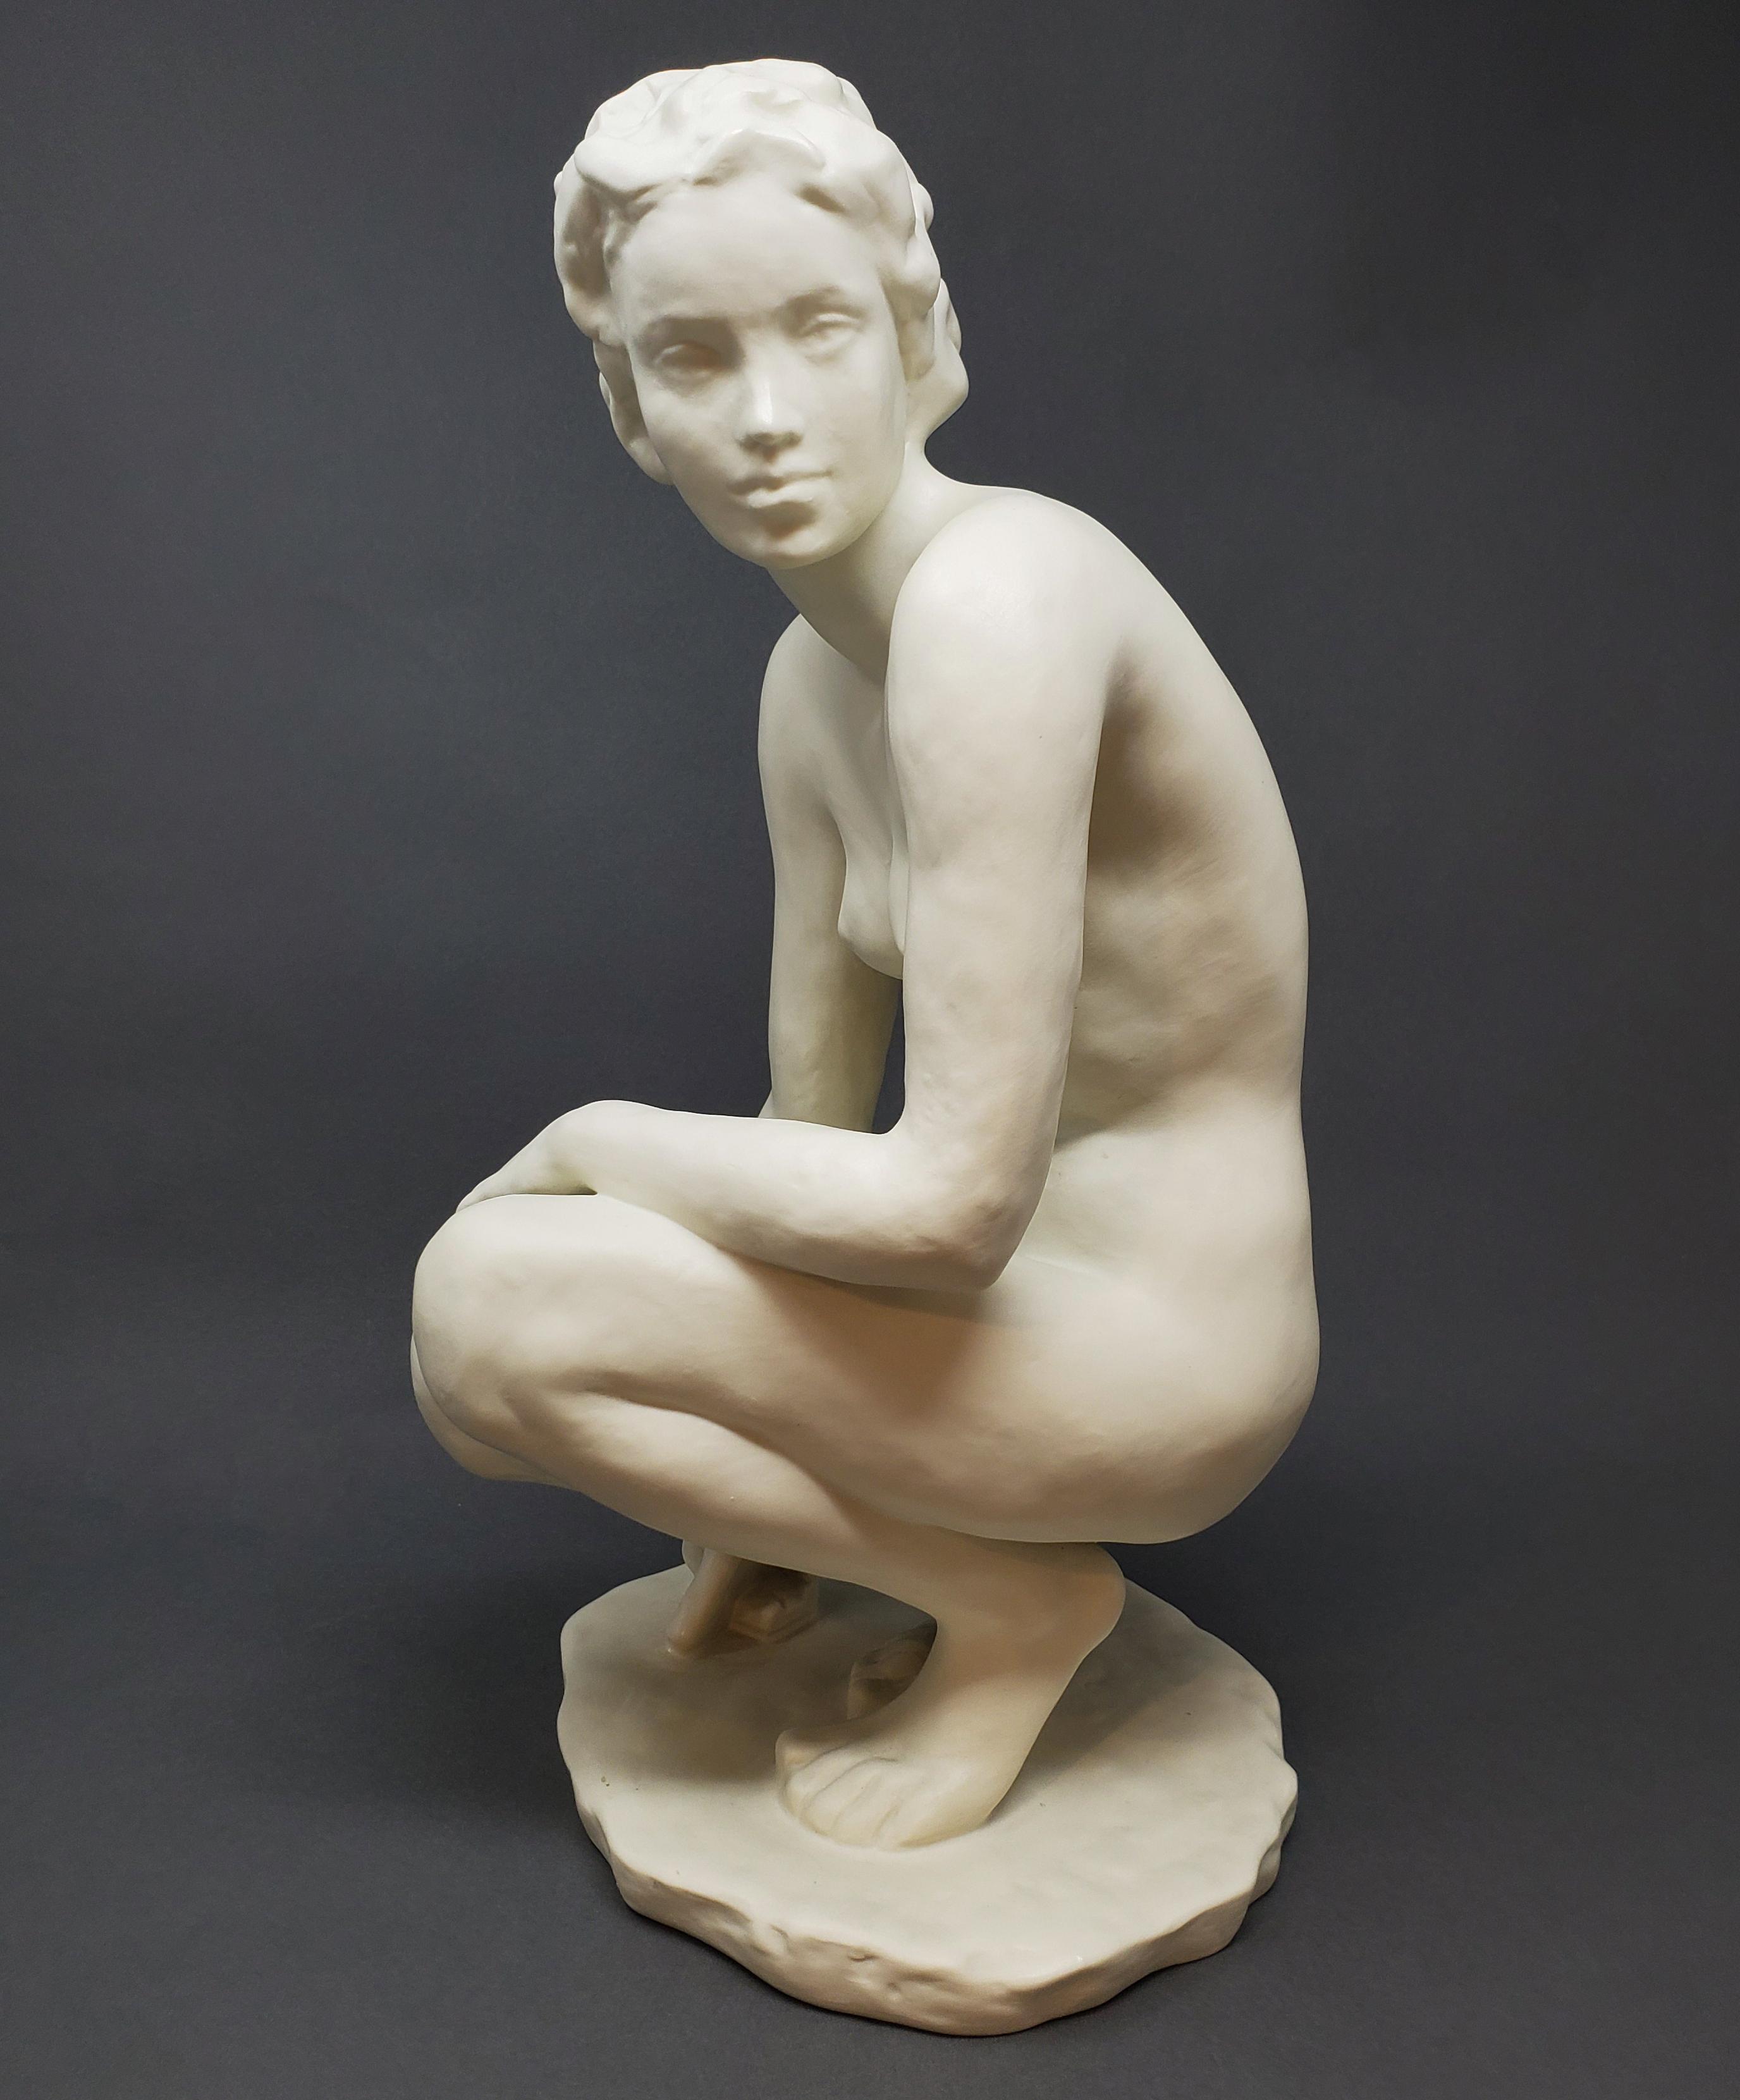 rosenthal-nude-large.jpg